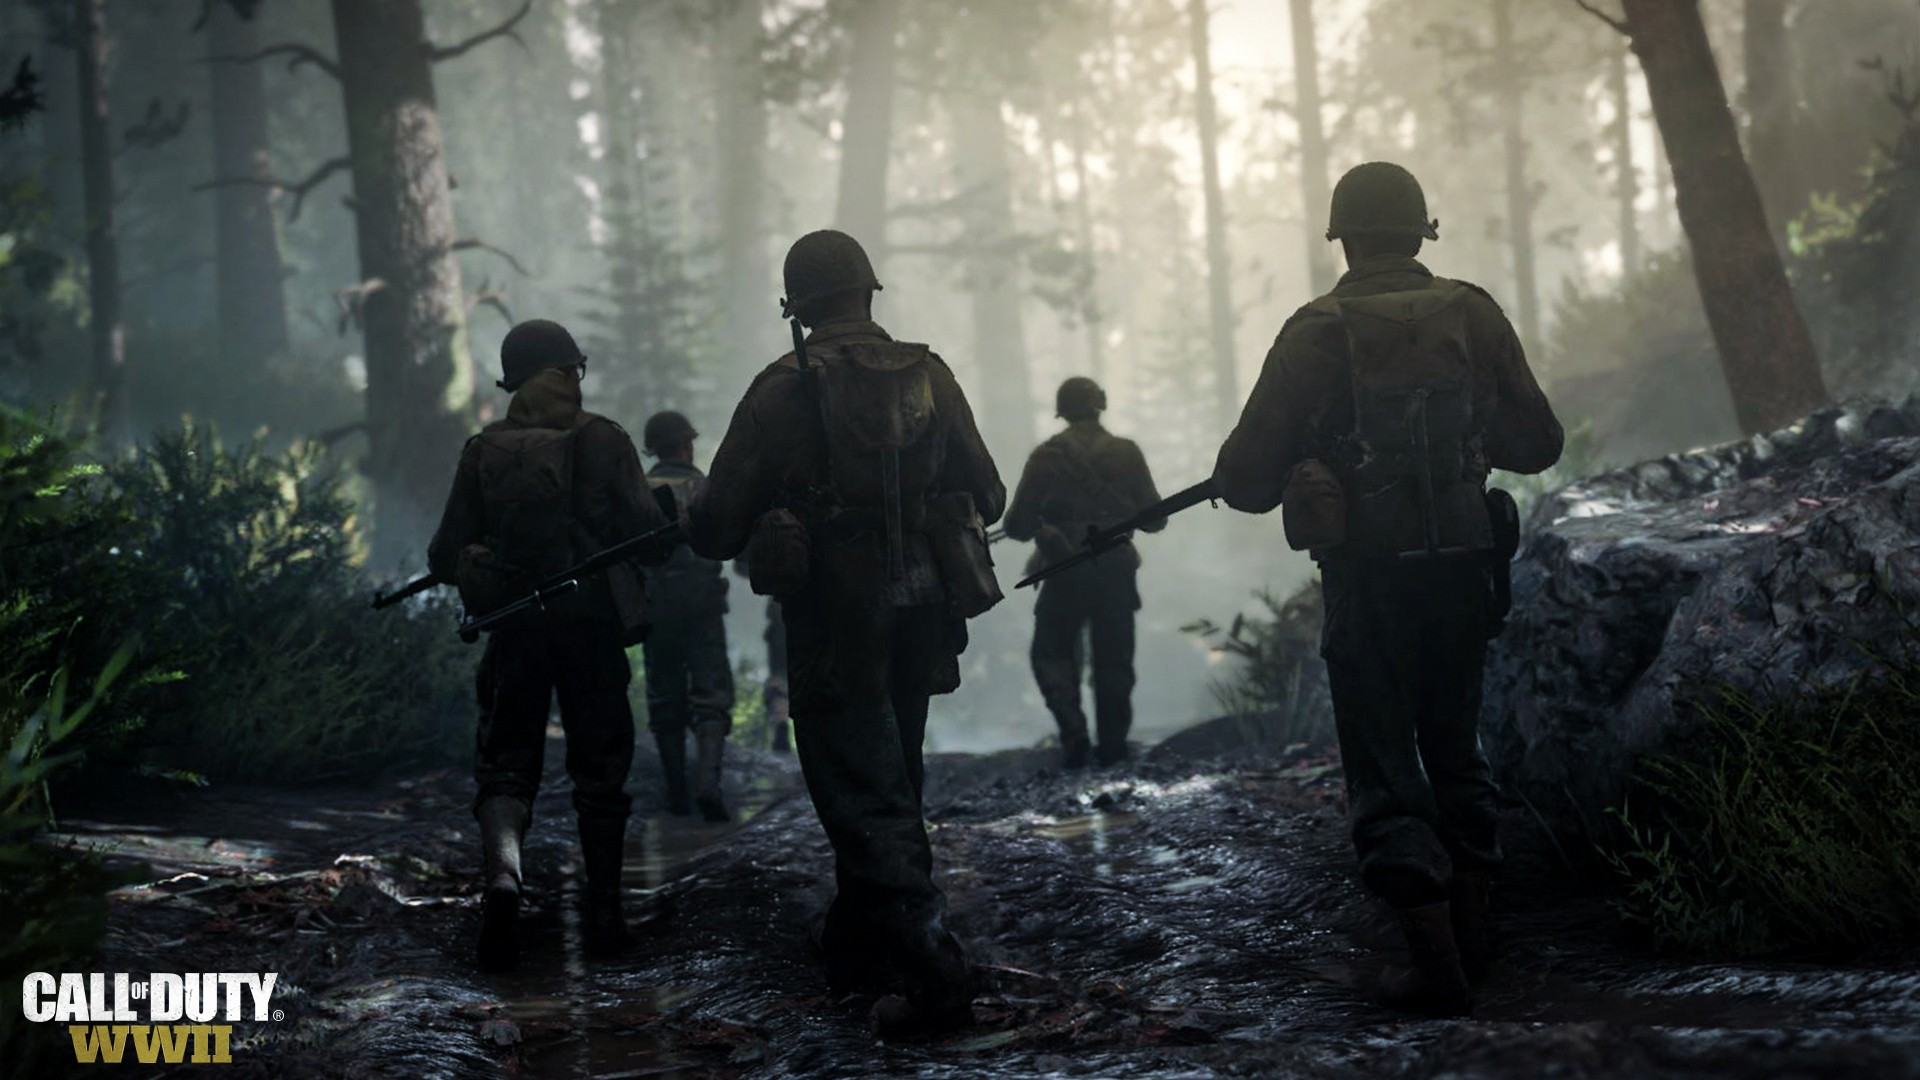 Fin de semana gratis de Call of Duty: WWII